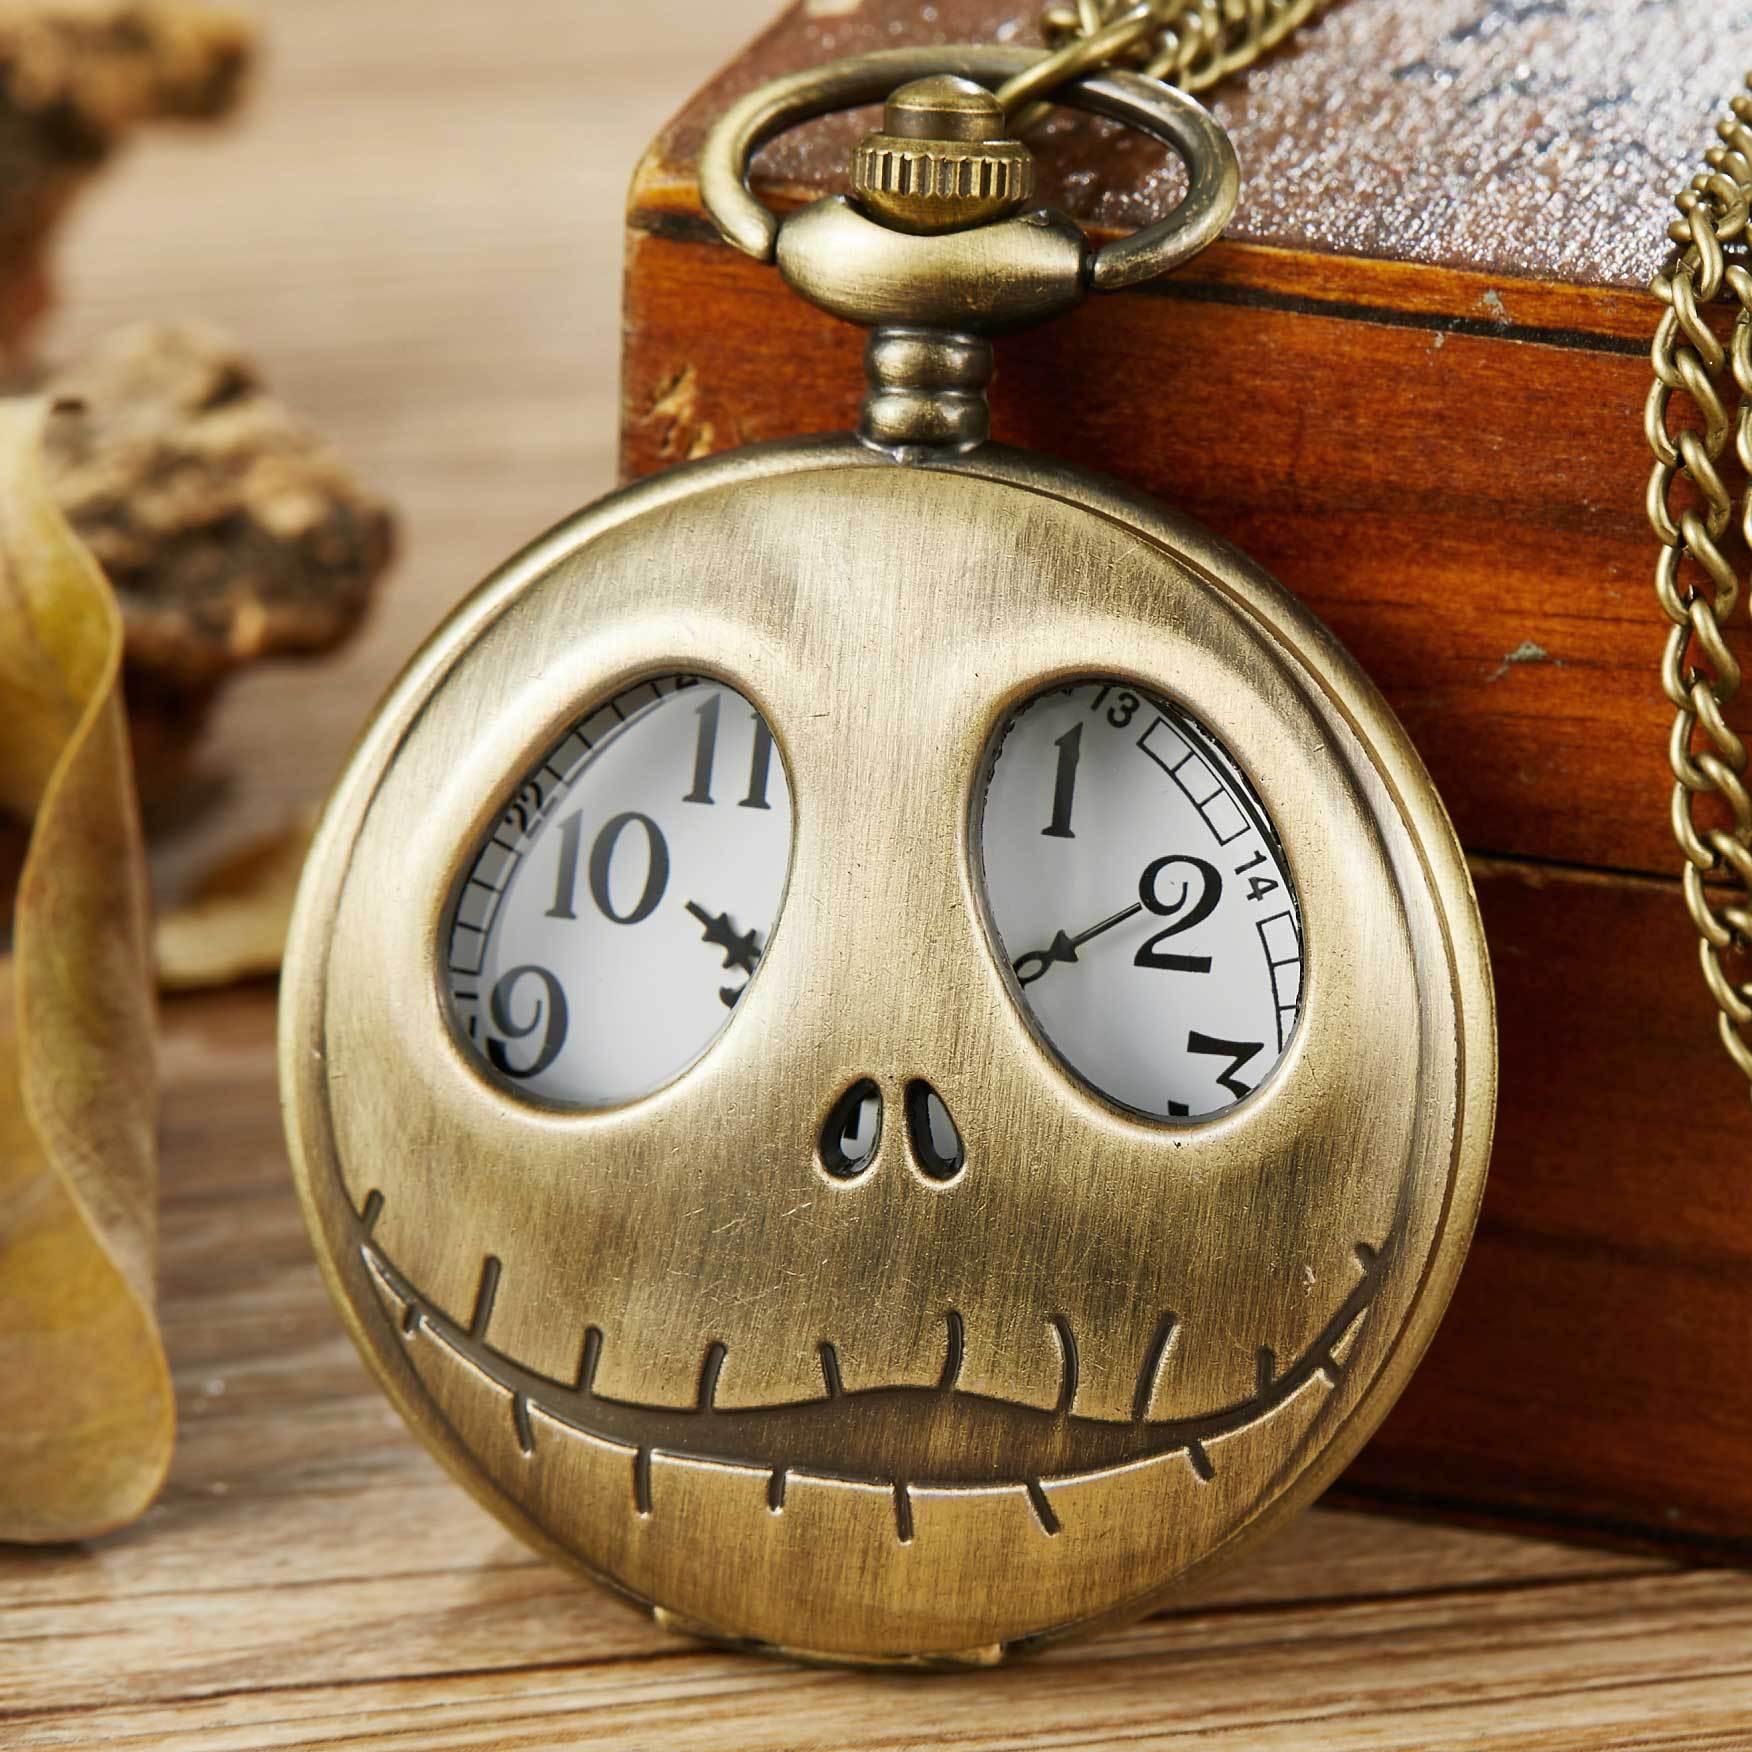 CK手表微商,外貿熱銷新款圣誕夜驚魂鏤空骷髏